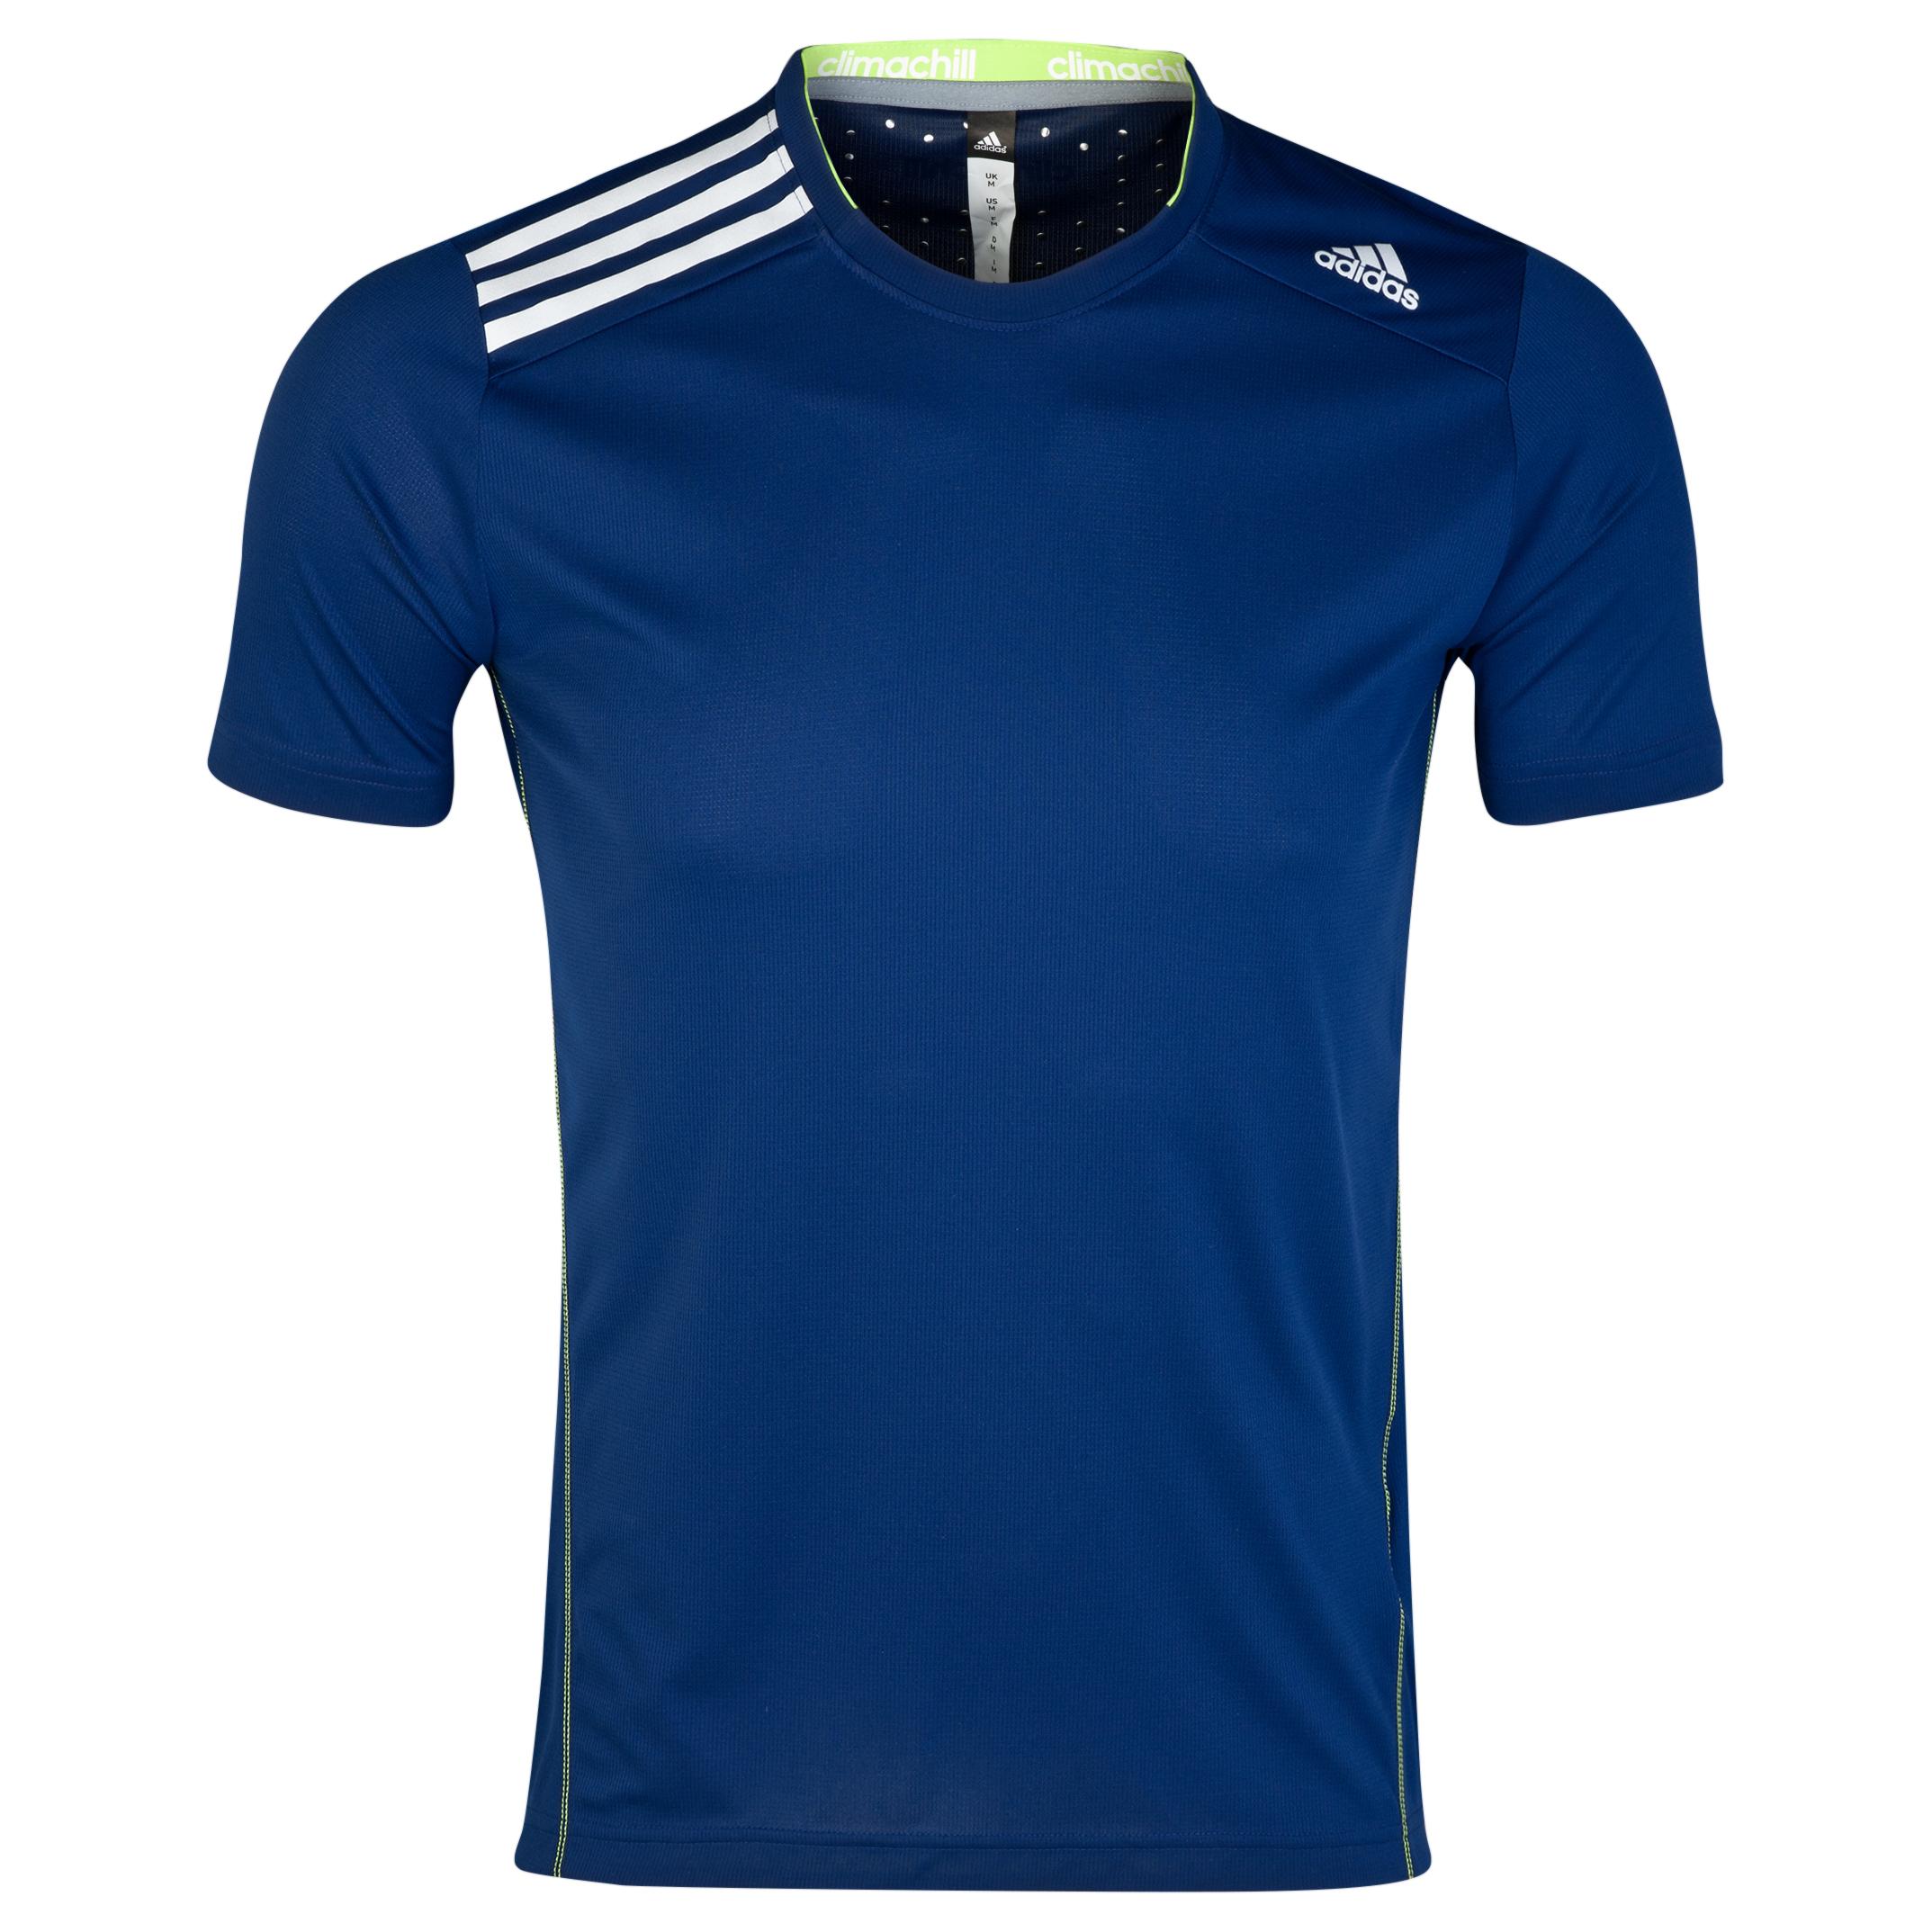 Adidas Climachill T-Shirt Blue